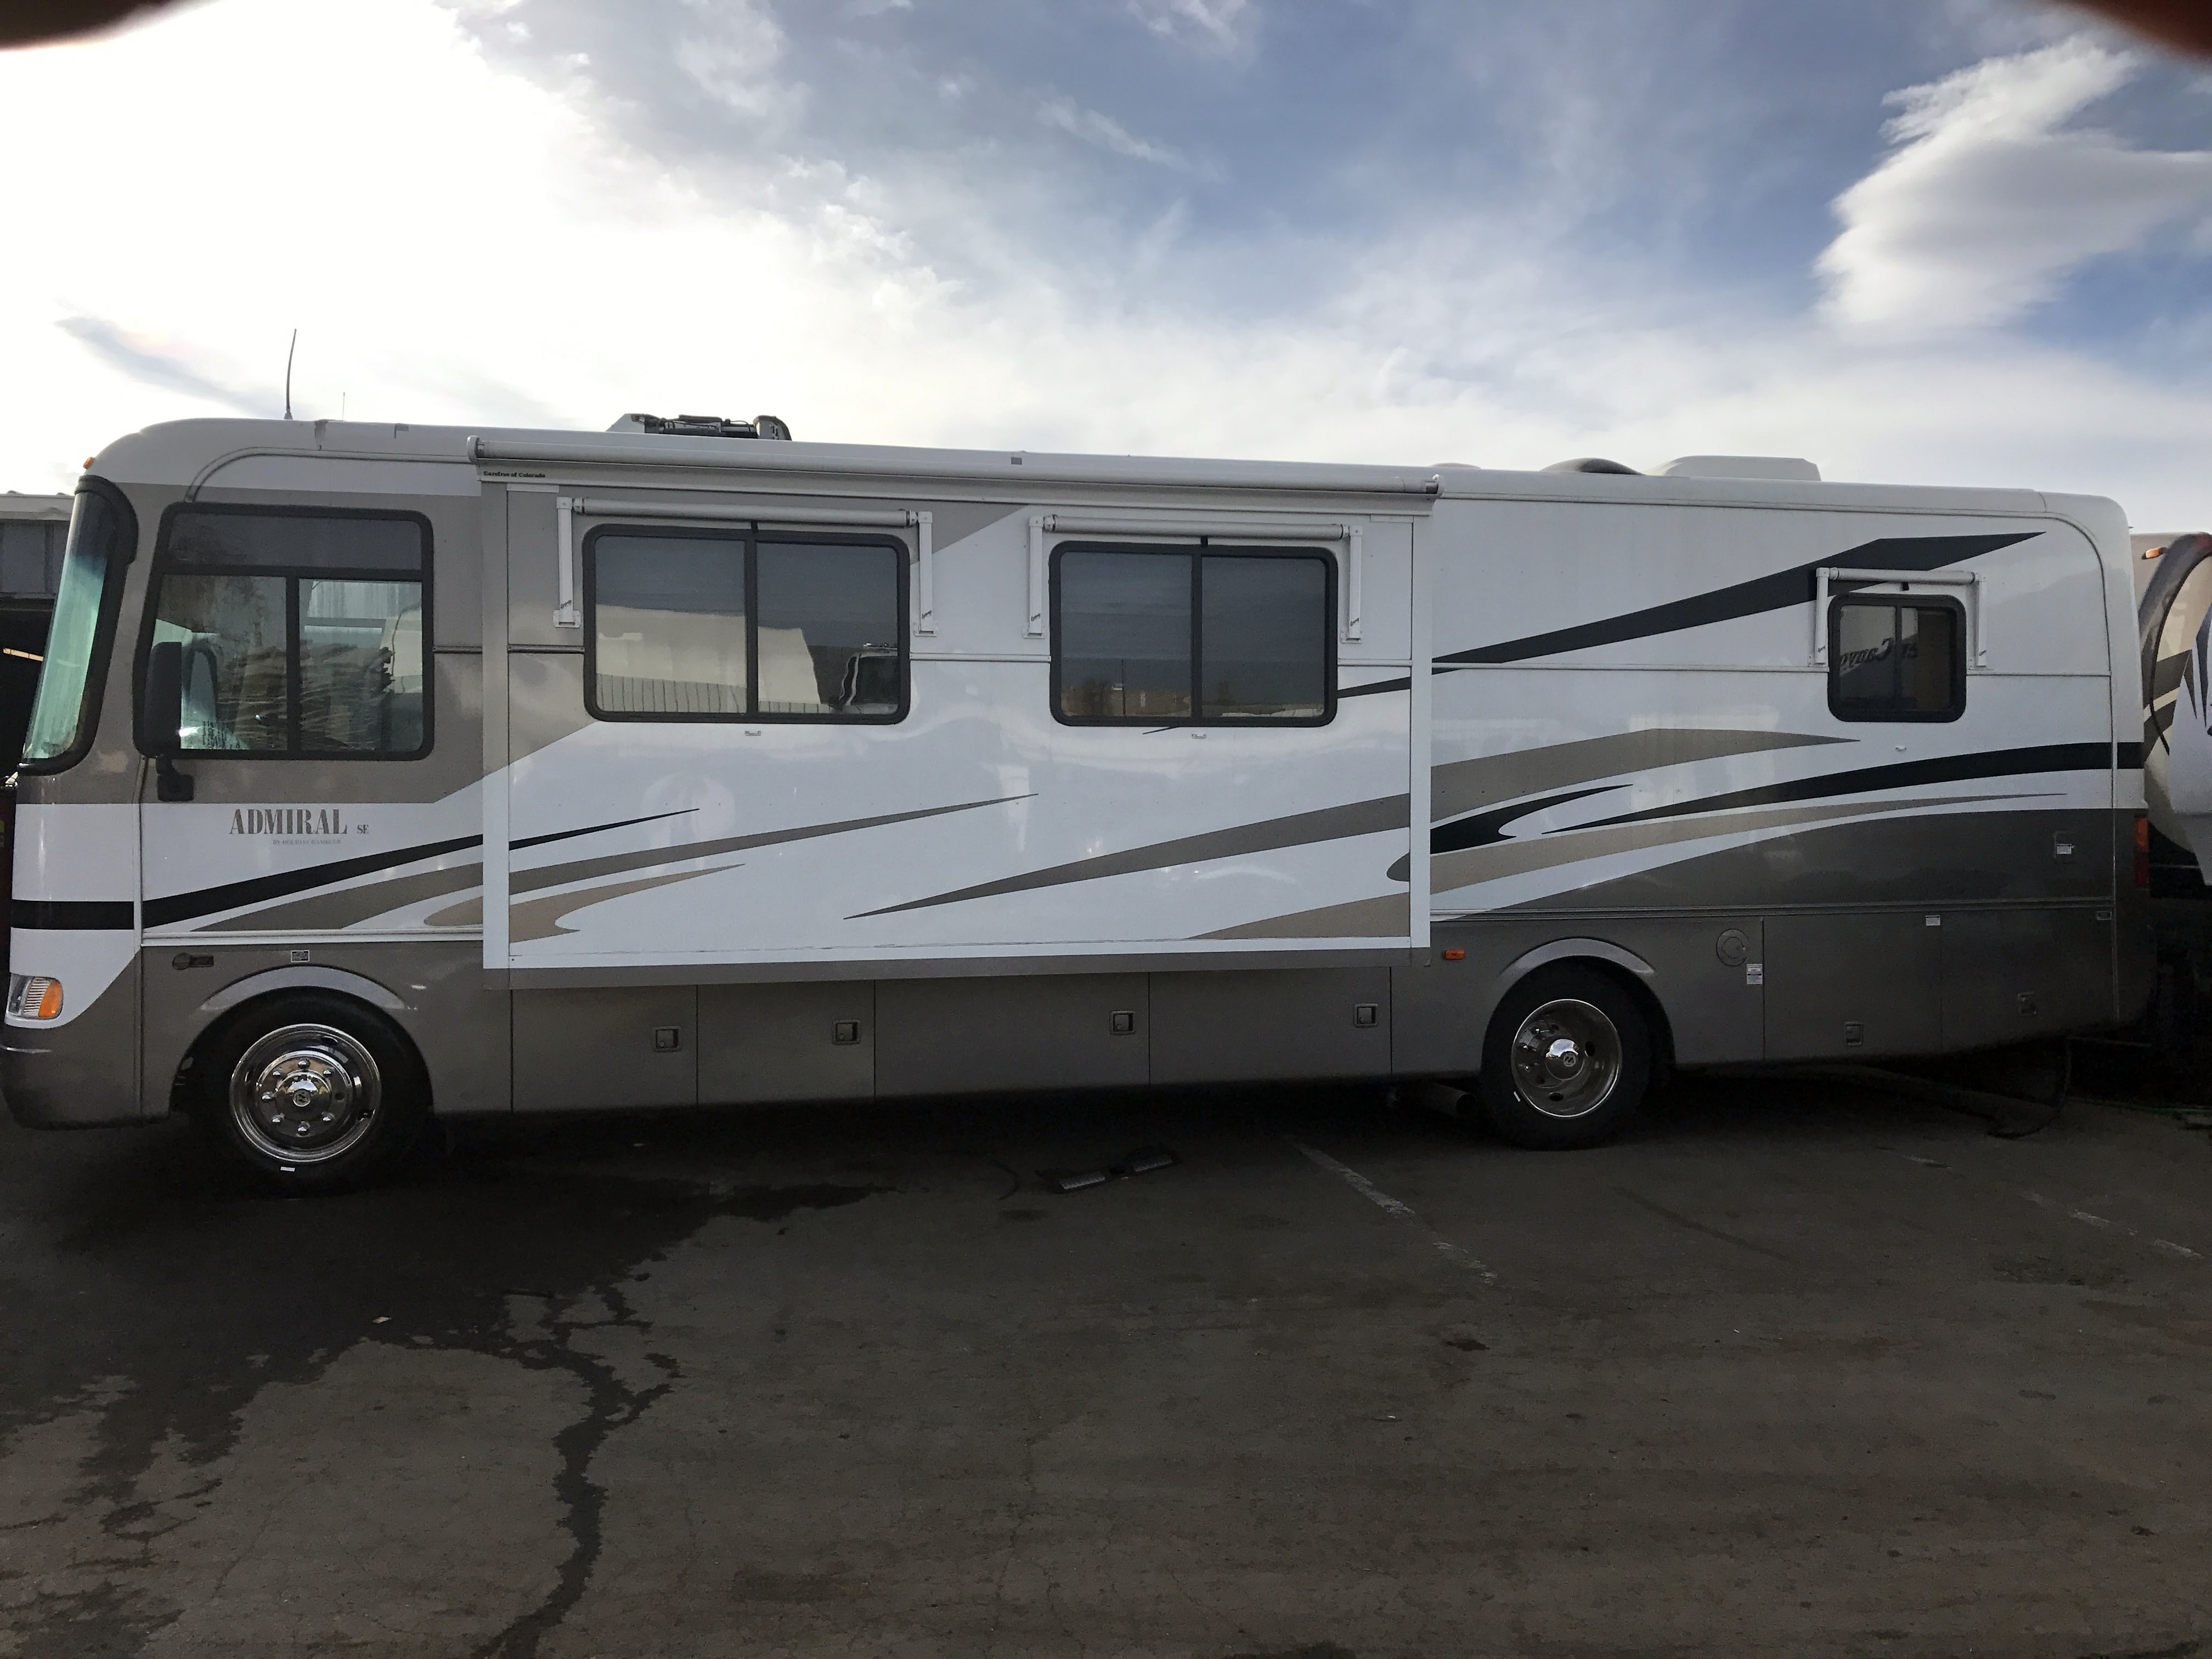 31 Fantastic Motorhomes For Sale Denver | fakrub.com